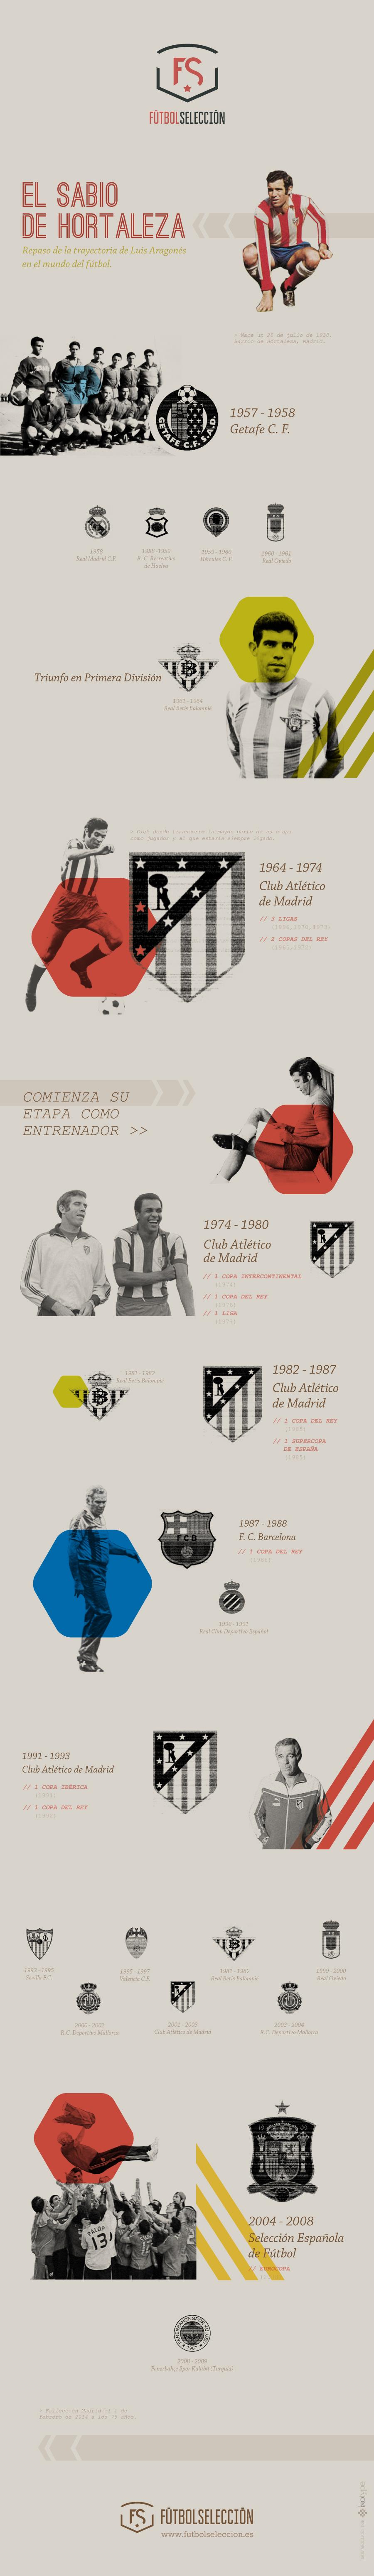 Infografia-Luis-Aragones-Futbol-Seleccion